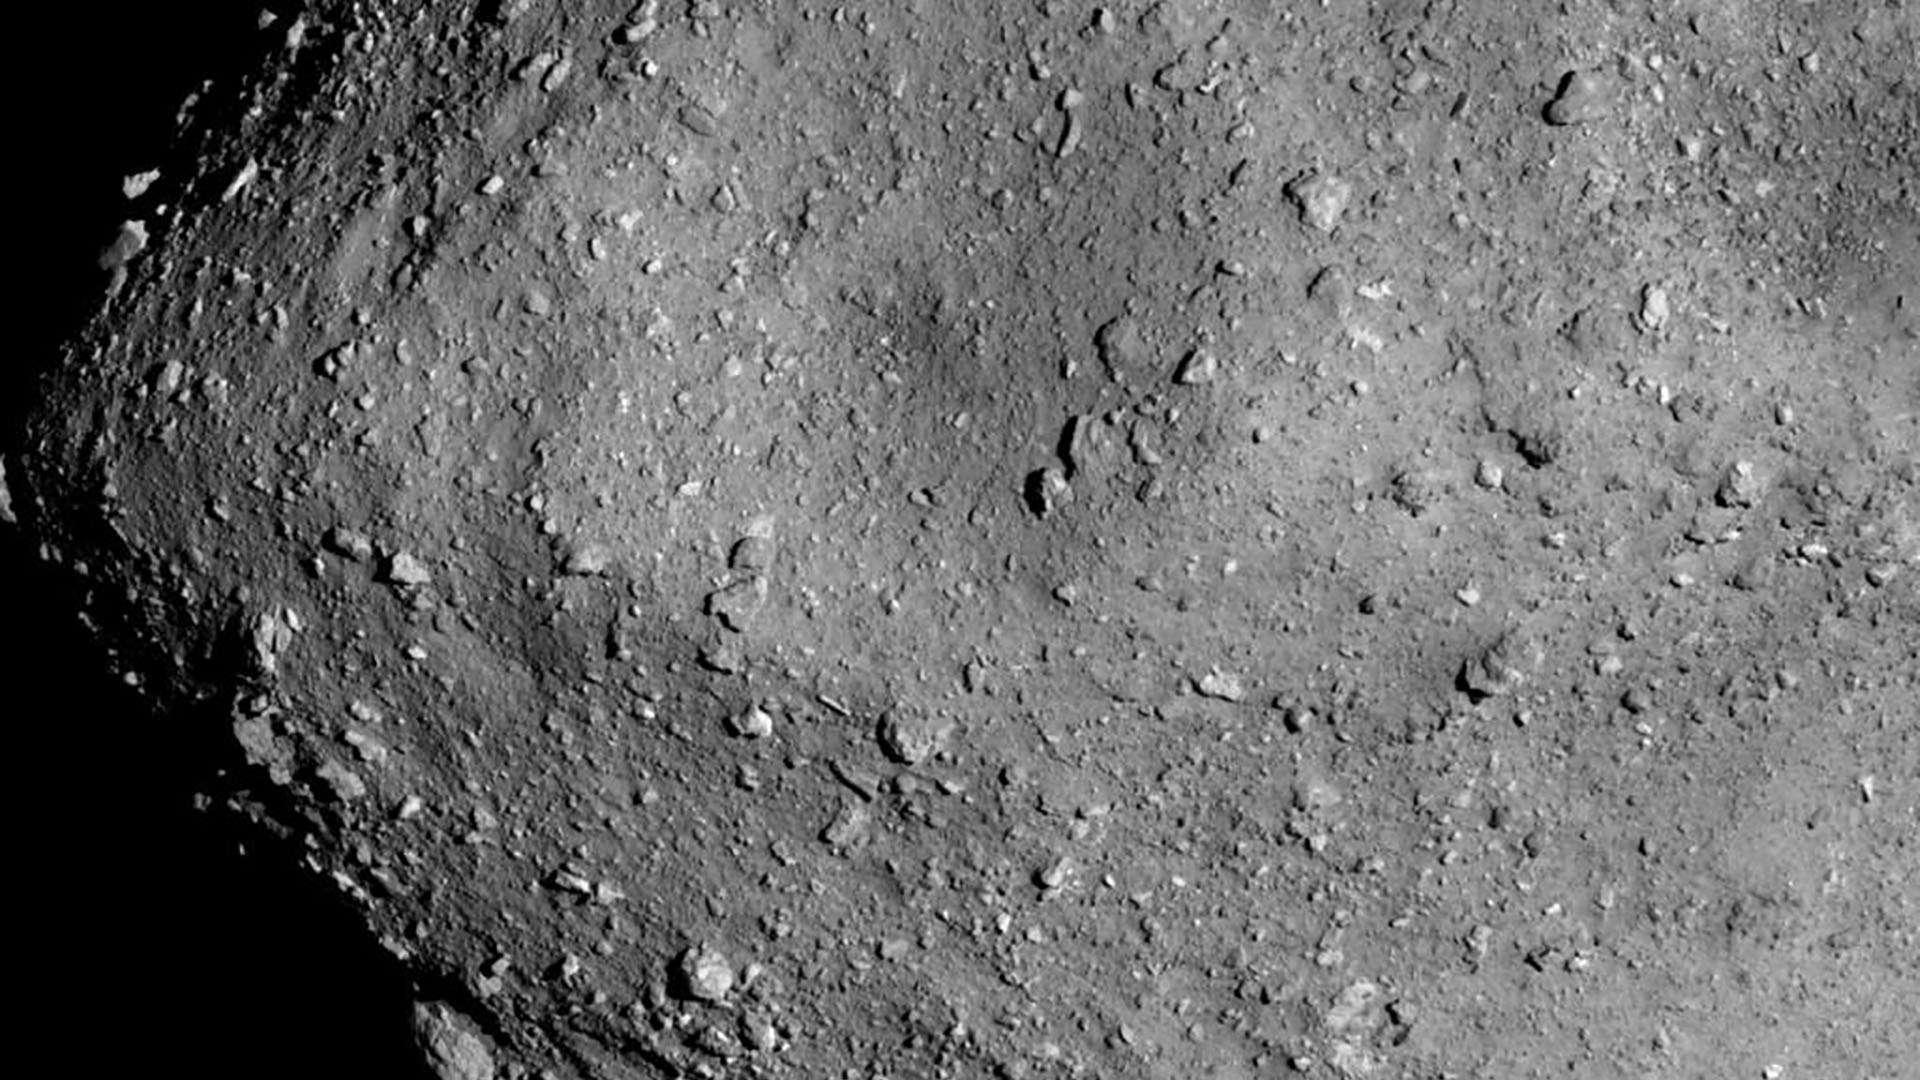 Détail de l'astéroïde Ryugu observé par la sonde Hayabusa-2. © Jaxa